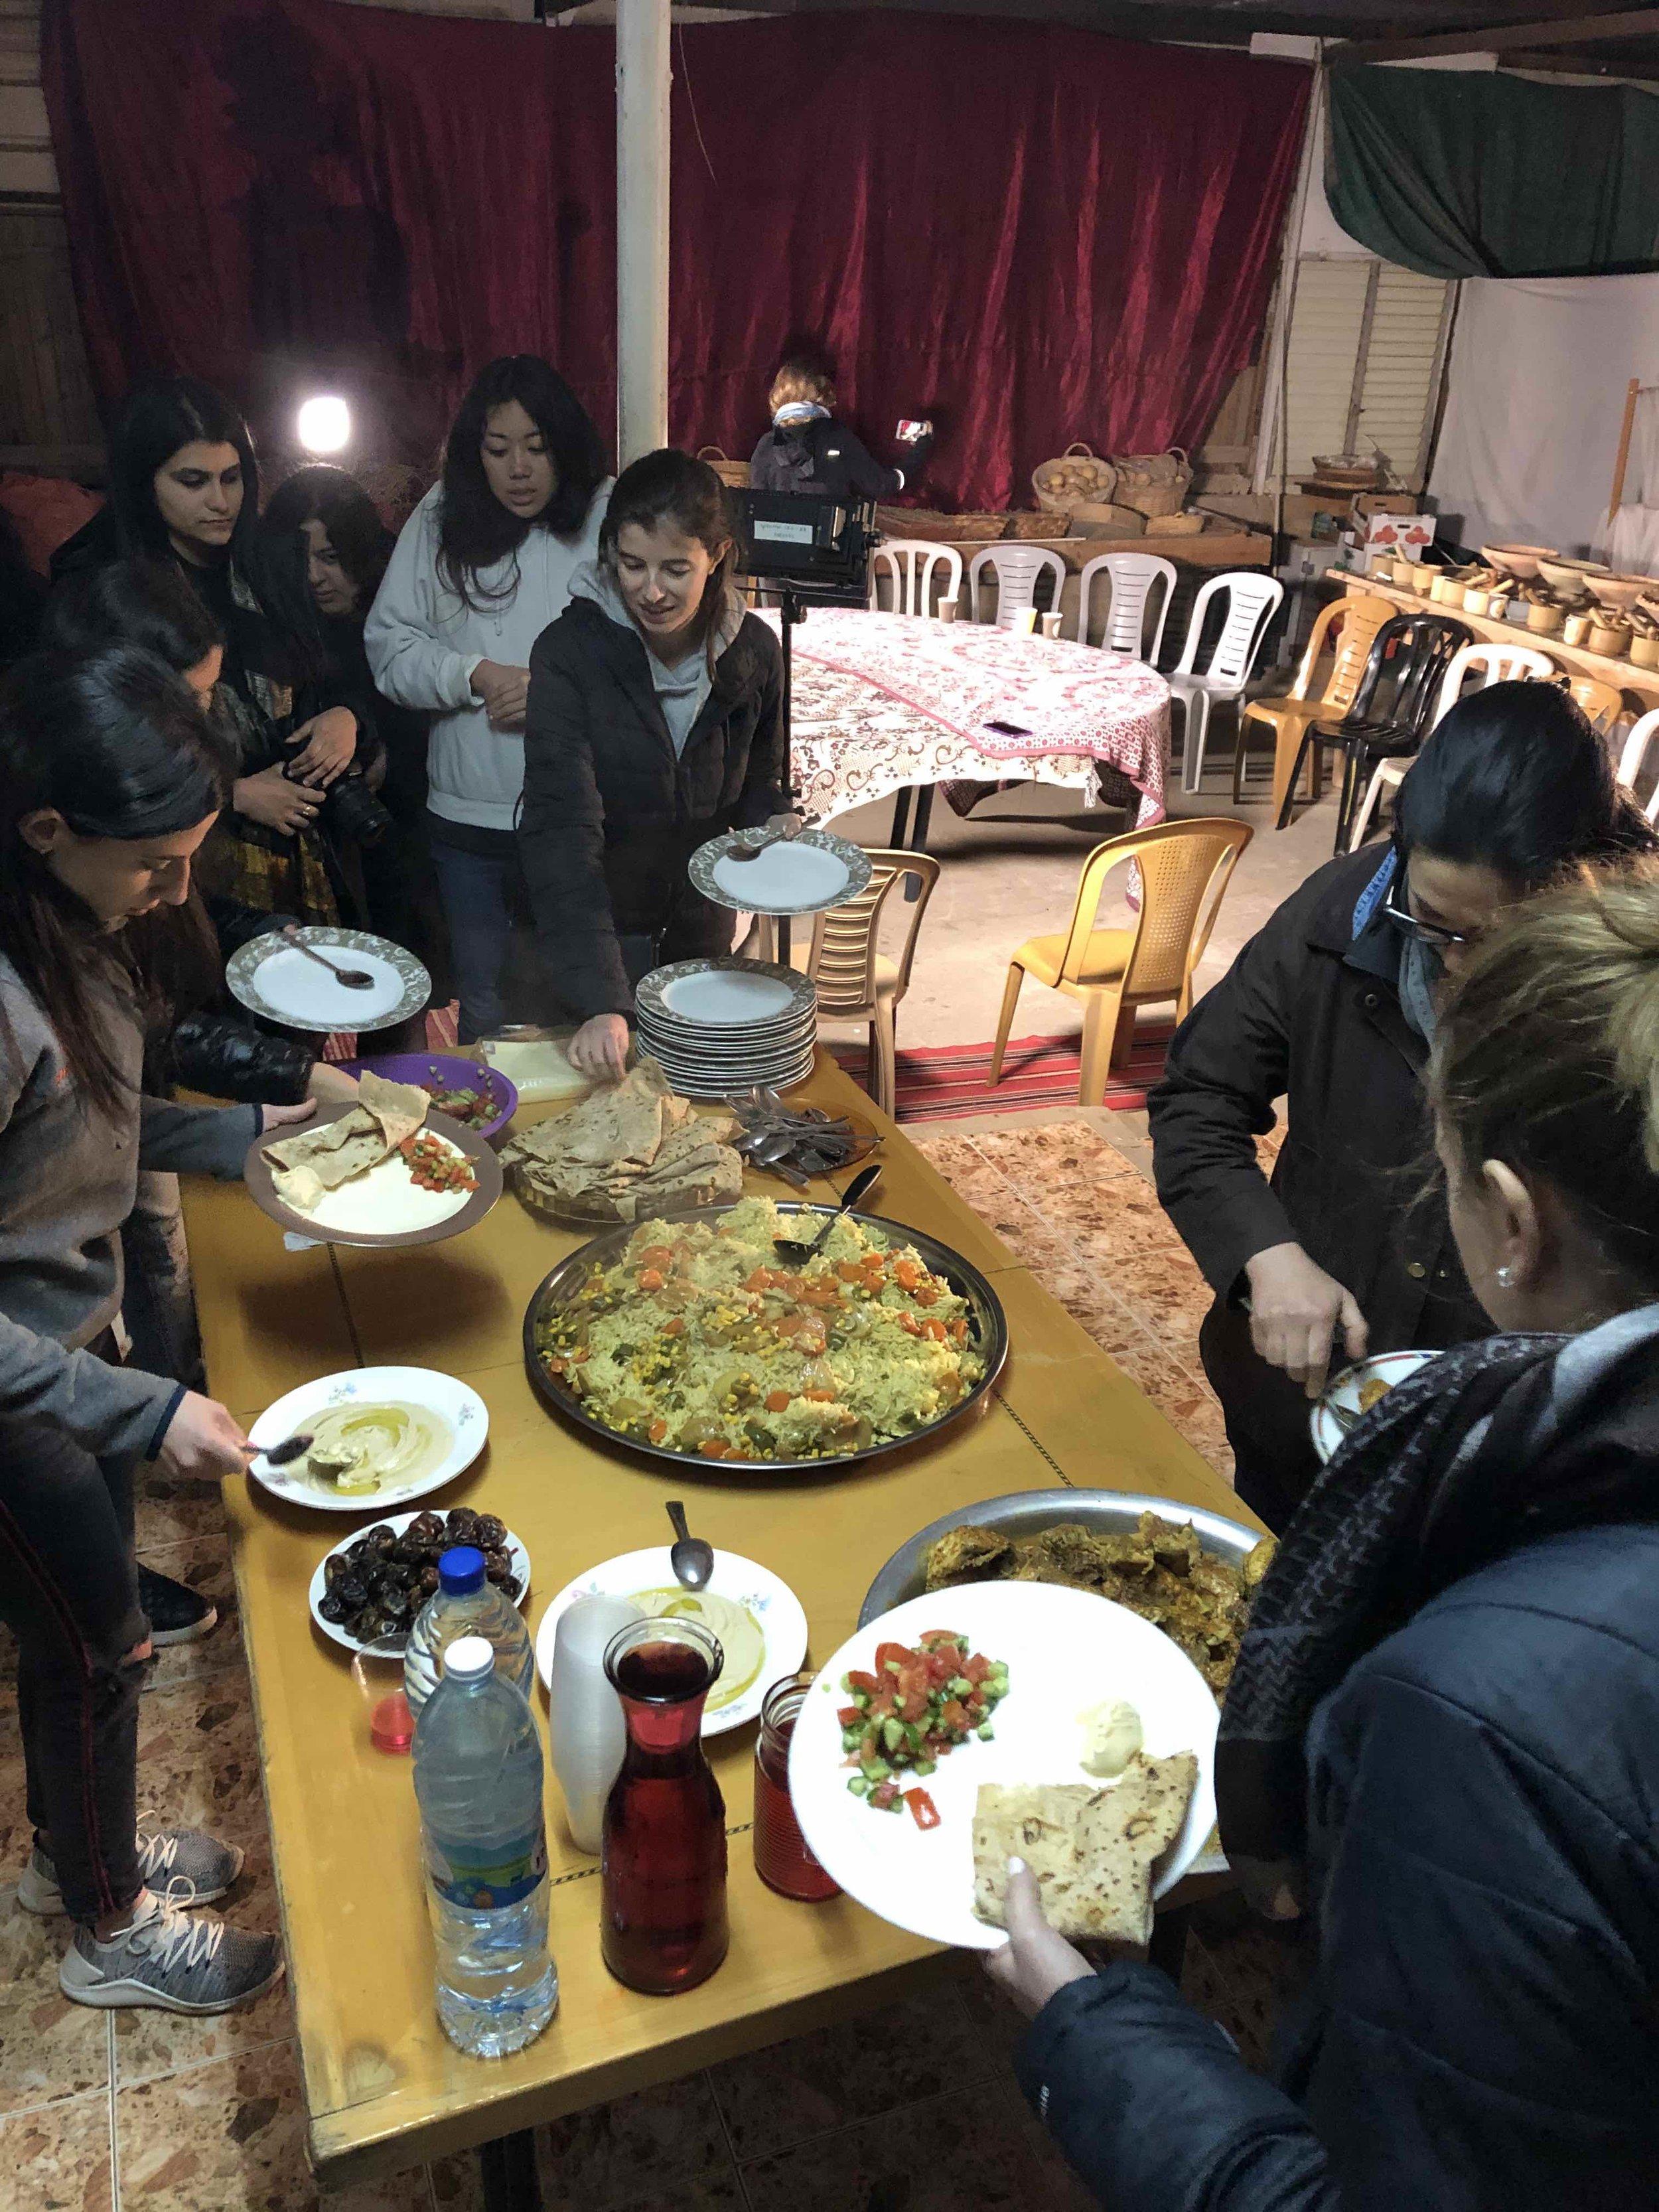 Students enjoy a Bedouin dinner.